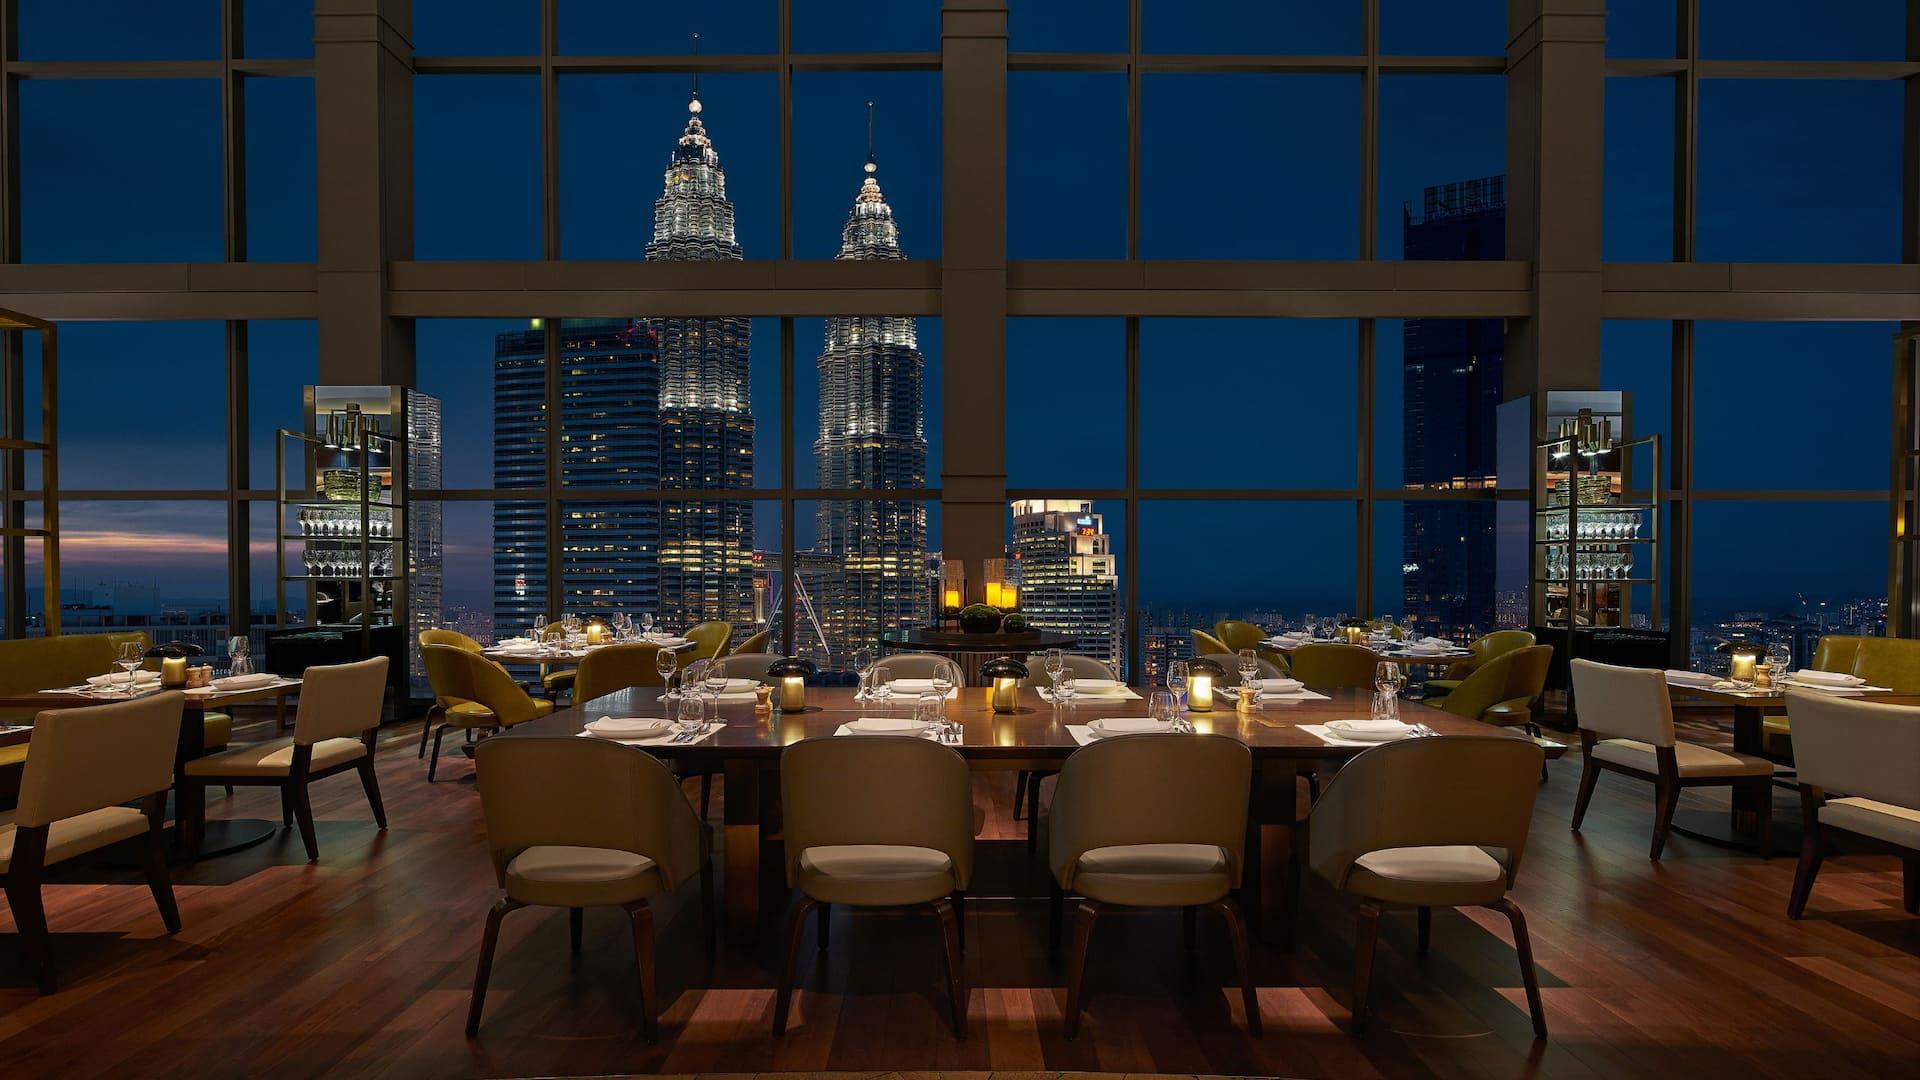 THIRTY8 Restaurant Kuala Lumpur (Nighttime Seating)